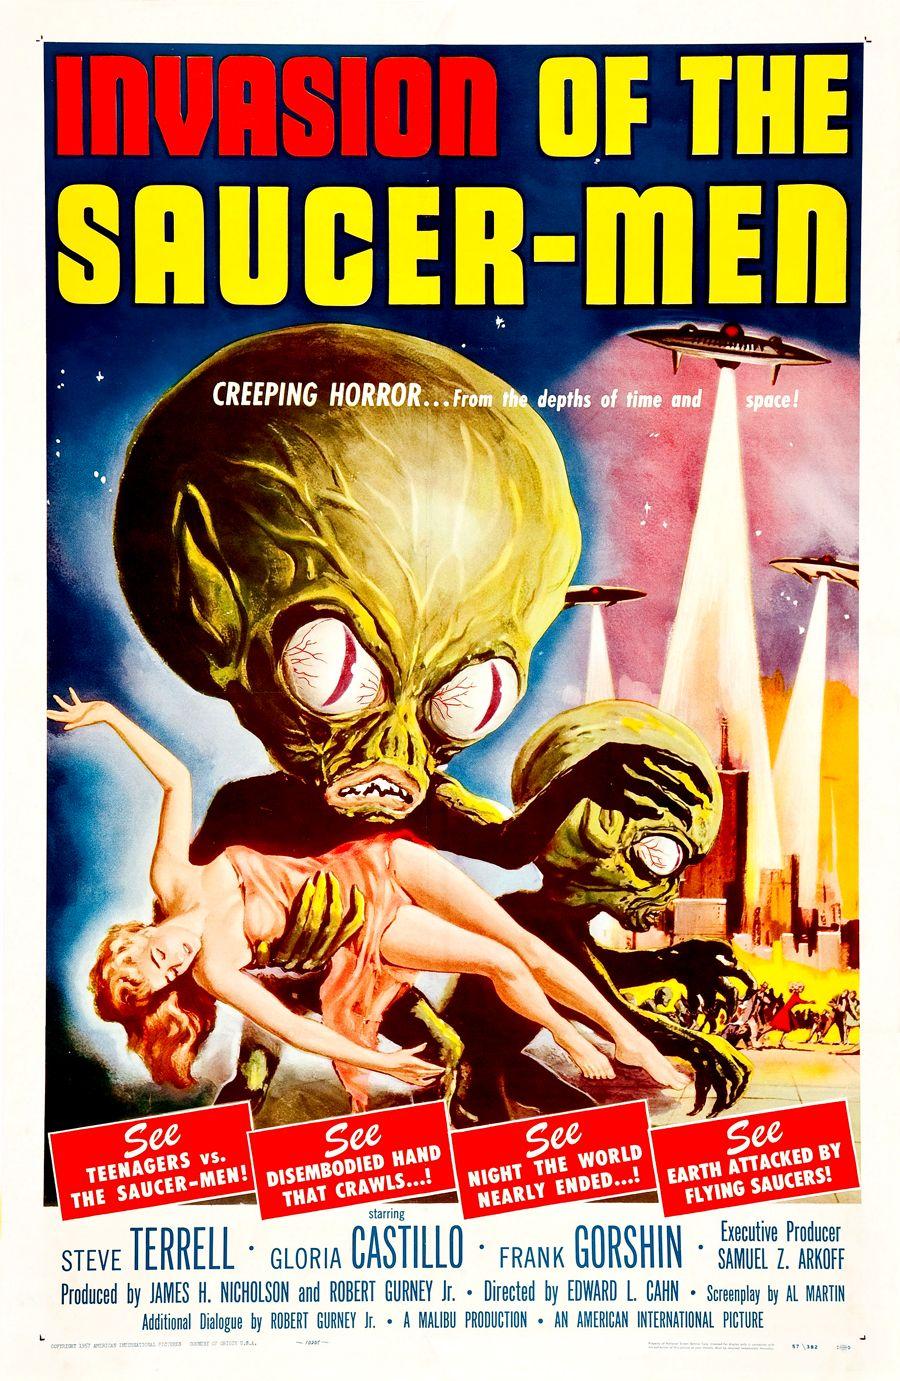 Film Noir Classic Film Classic Hollywood Crime Films Movie Posters Graphic Desig Classic Movie Posters Science Fiction Movie Posters Science Fiction Movie